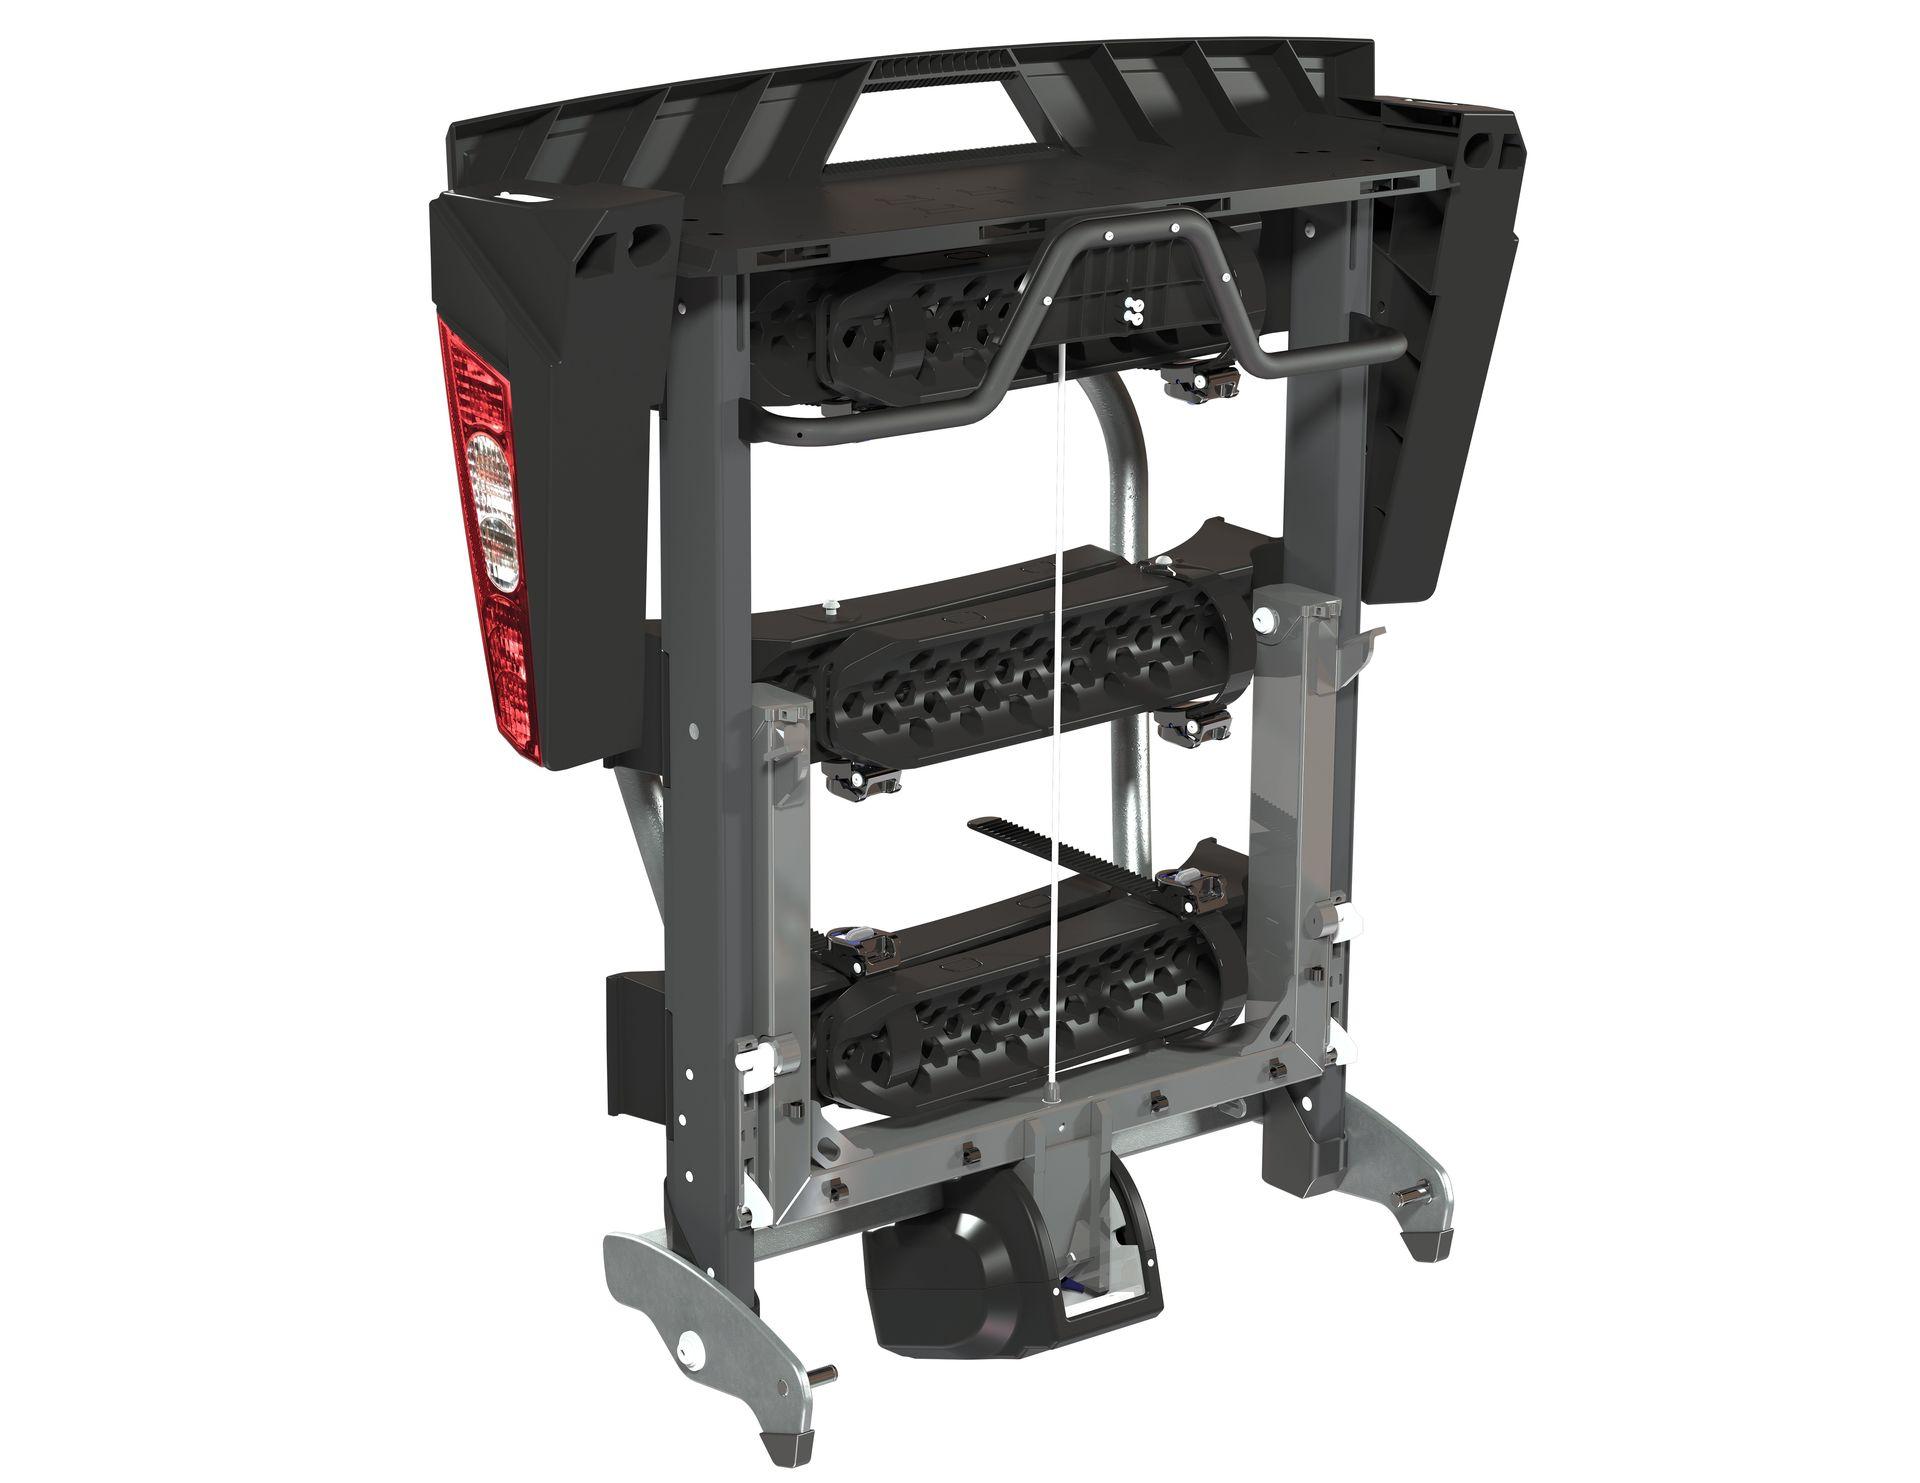 YAKIMA Foldclick 3 składany bagażnik na 3 rowery